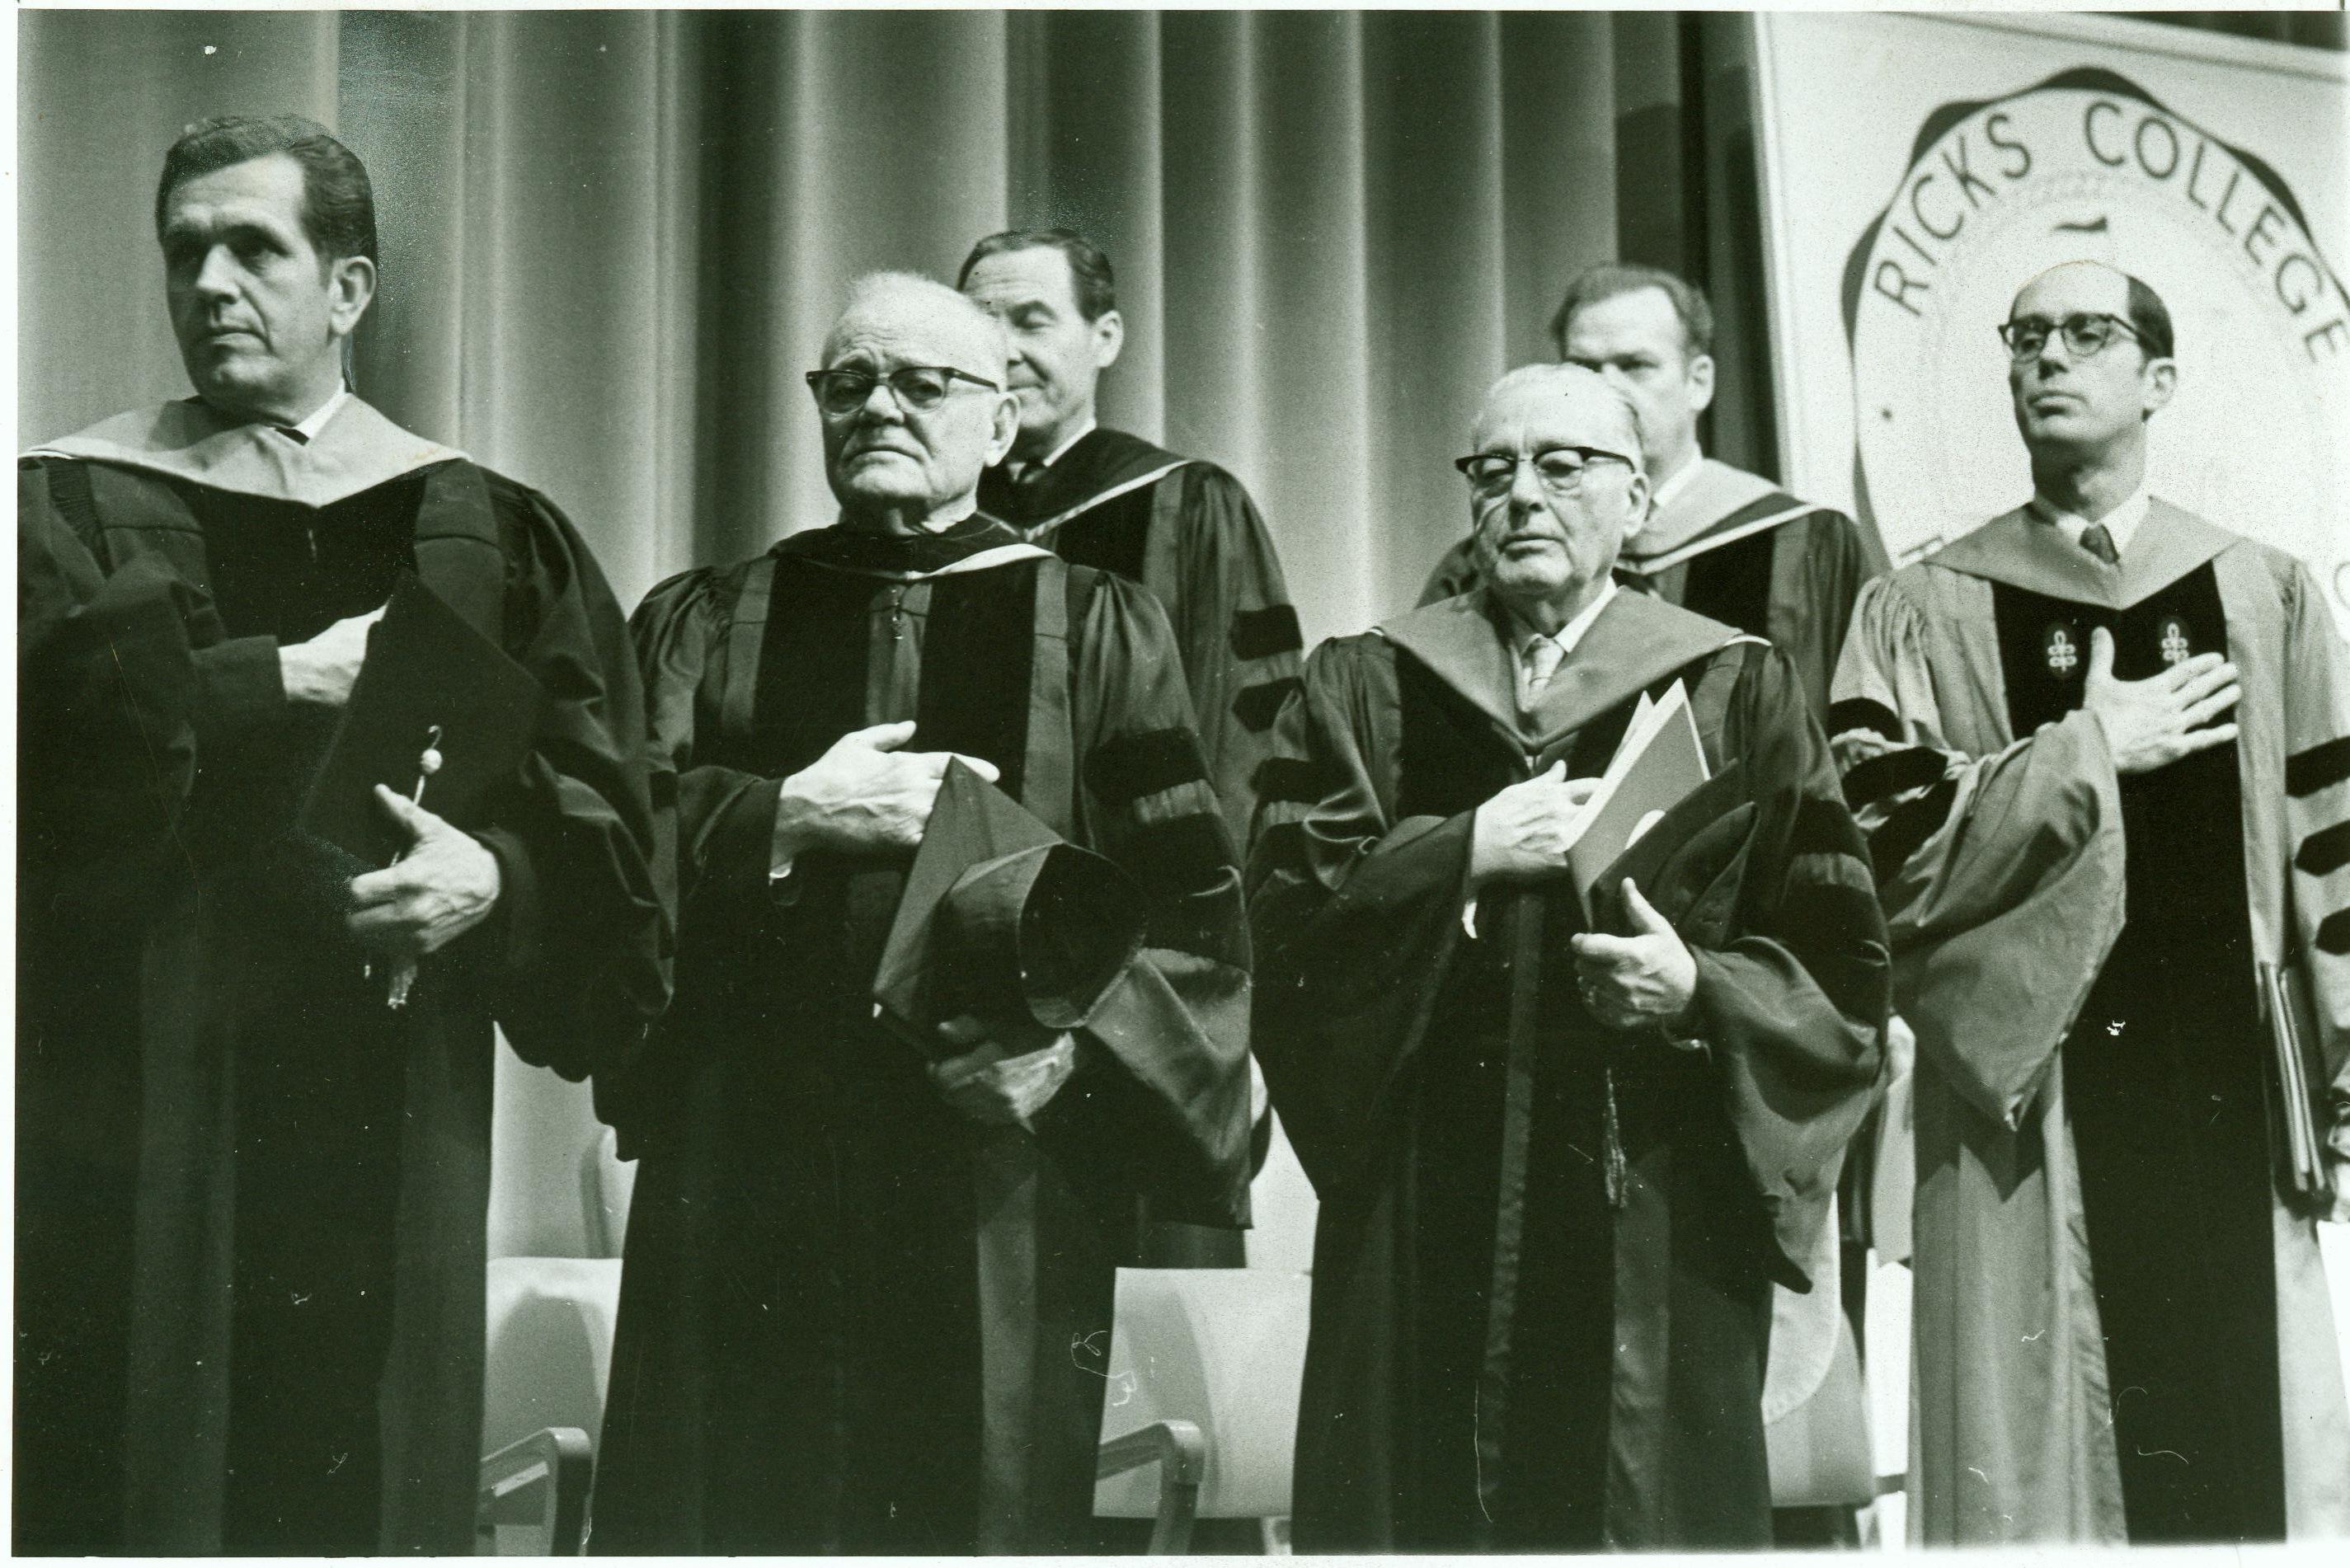 Elder Boyd K. Packer (from left), Elder Marion G. Romney, Bishop Robert L. Simpson, President Harold B. Lee, Elder Paul H. Dunn and Dr. Henry B. Eyring observe the flag ceremony at Dr. Eyring's inaugural at Ricks College.